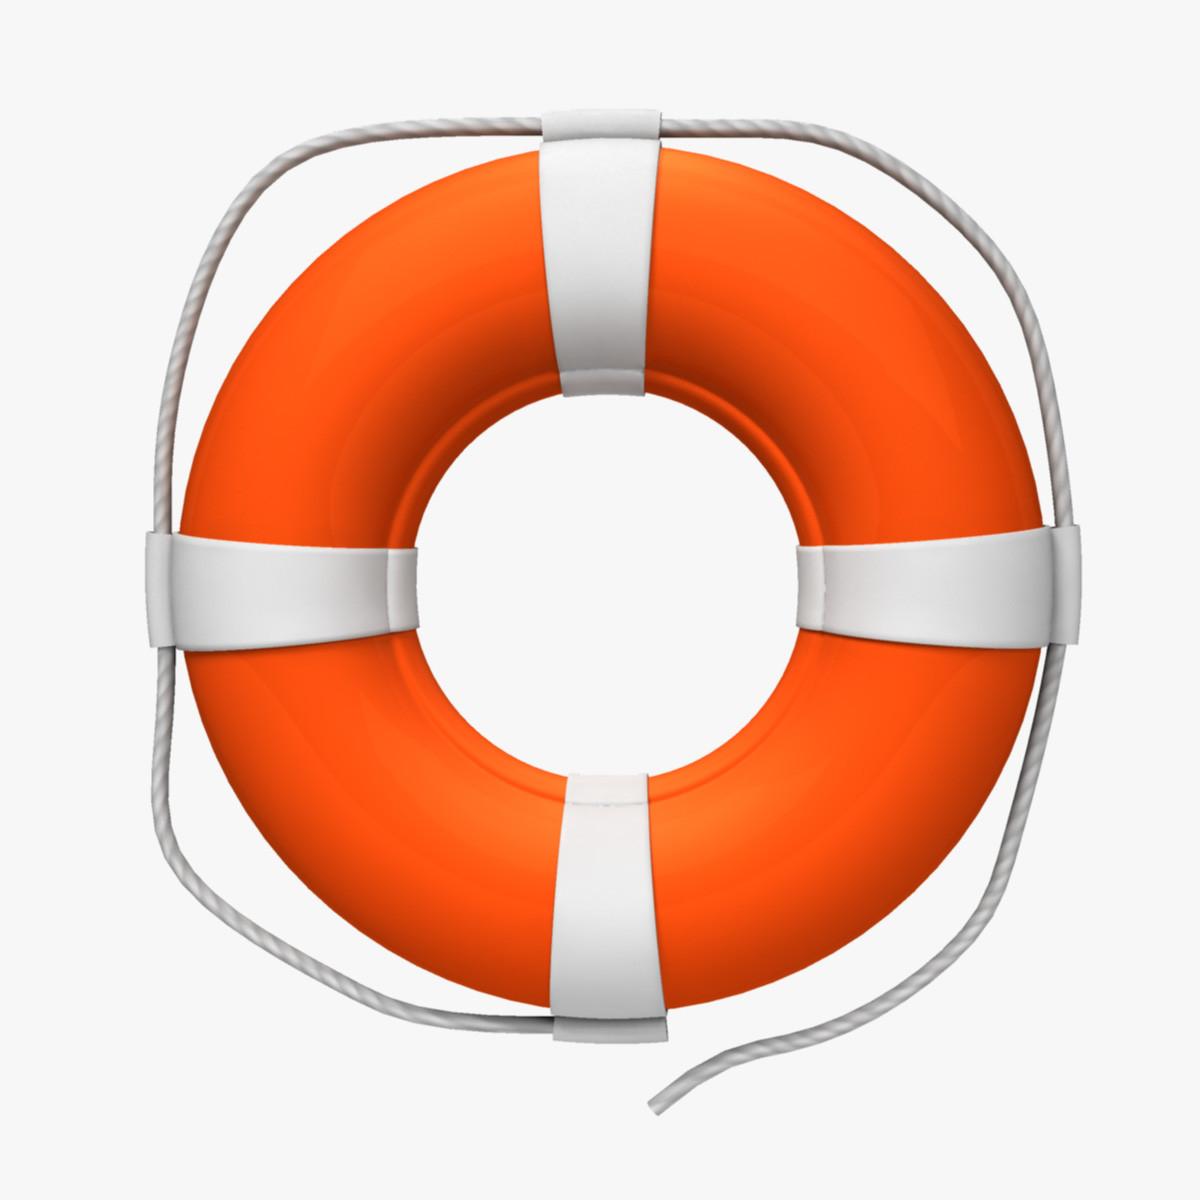 Ring clipart life preserver #11